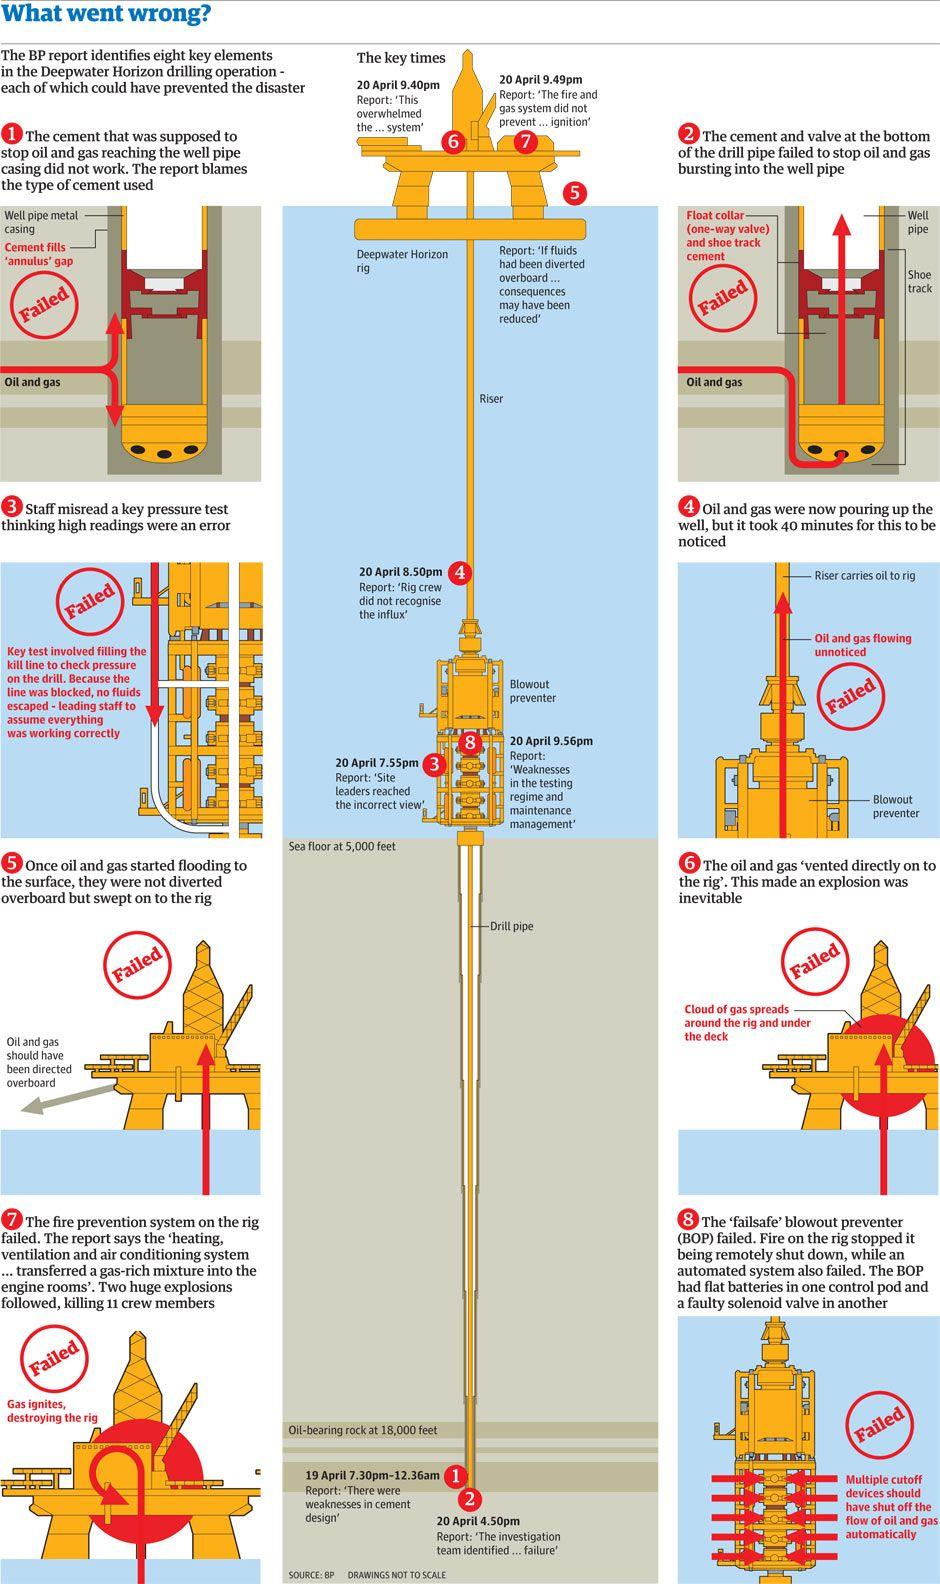 BP oil spill: the official Deepwater Horizon disaster